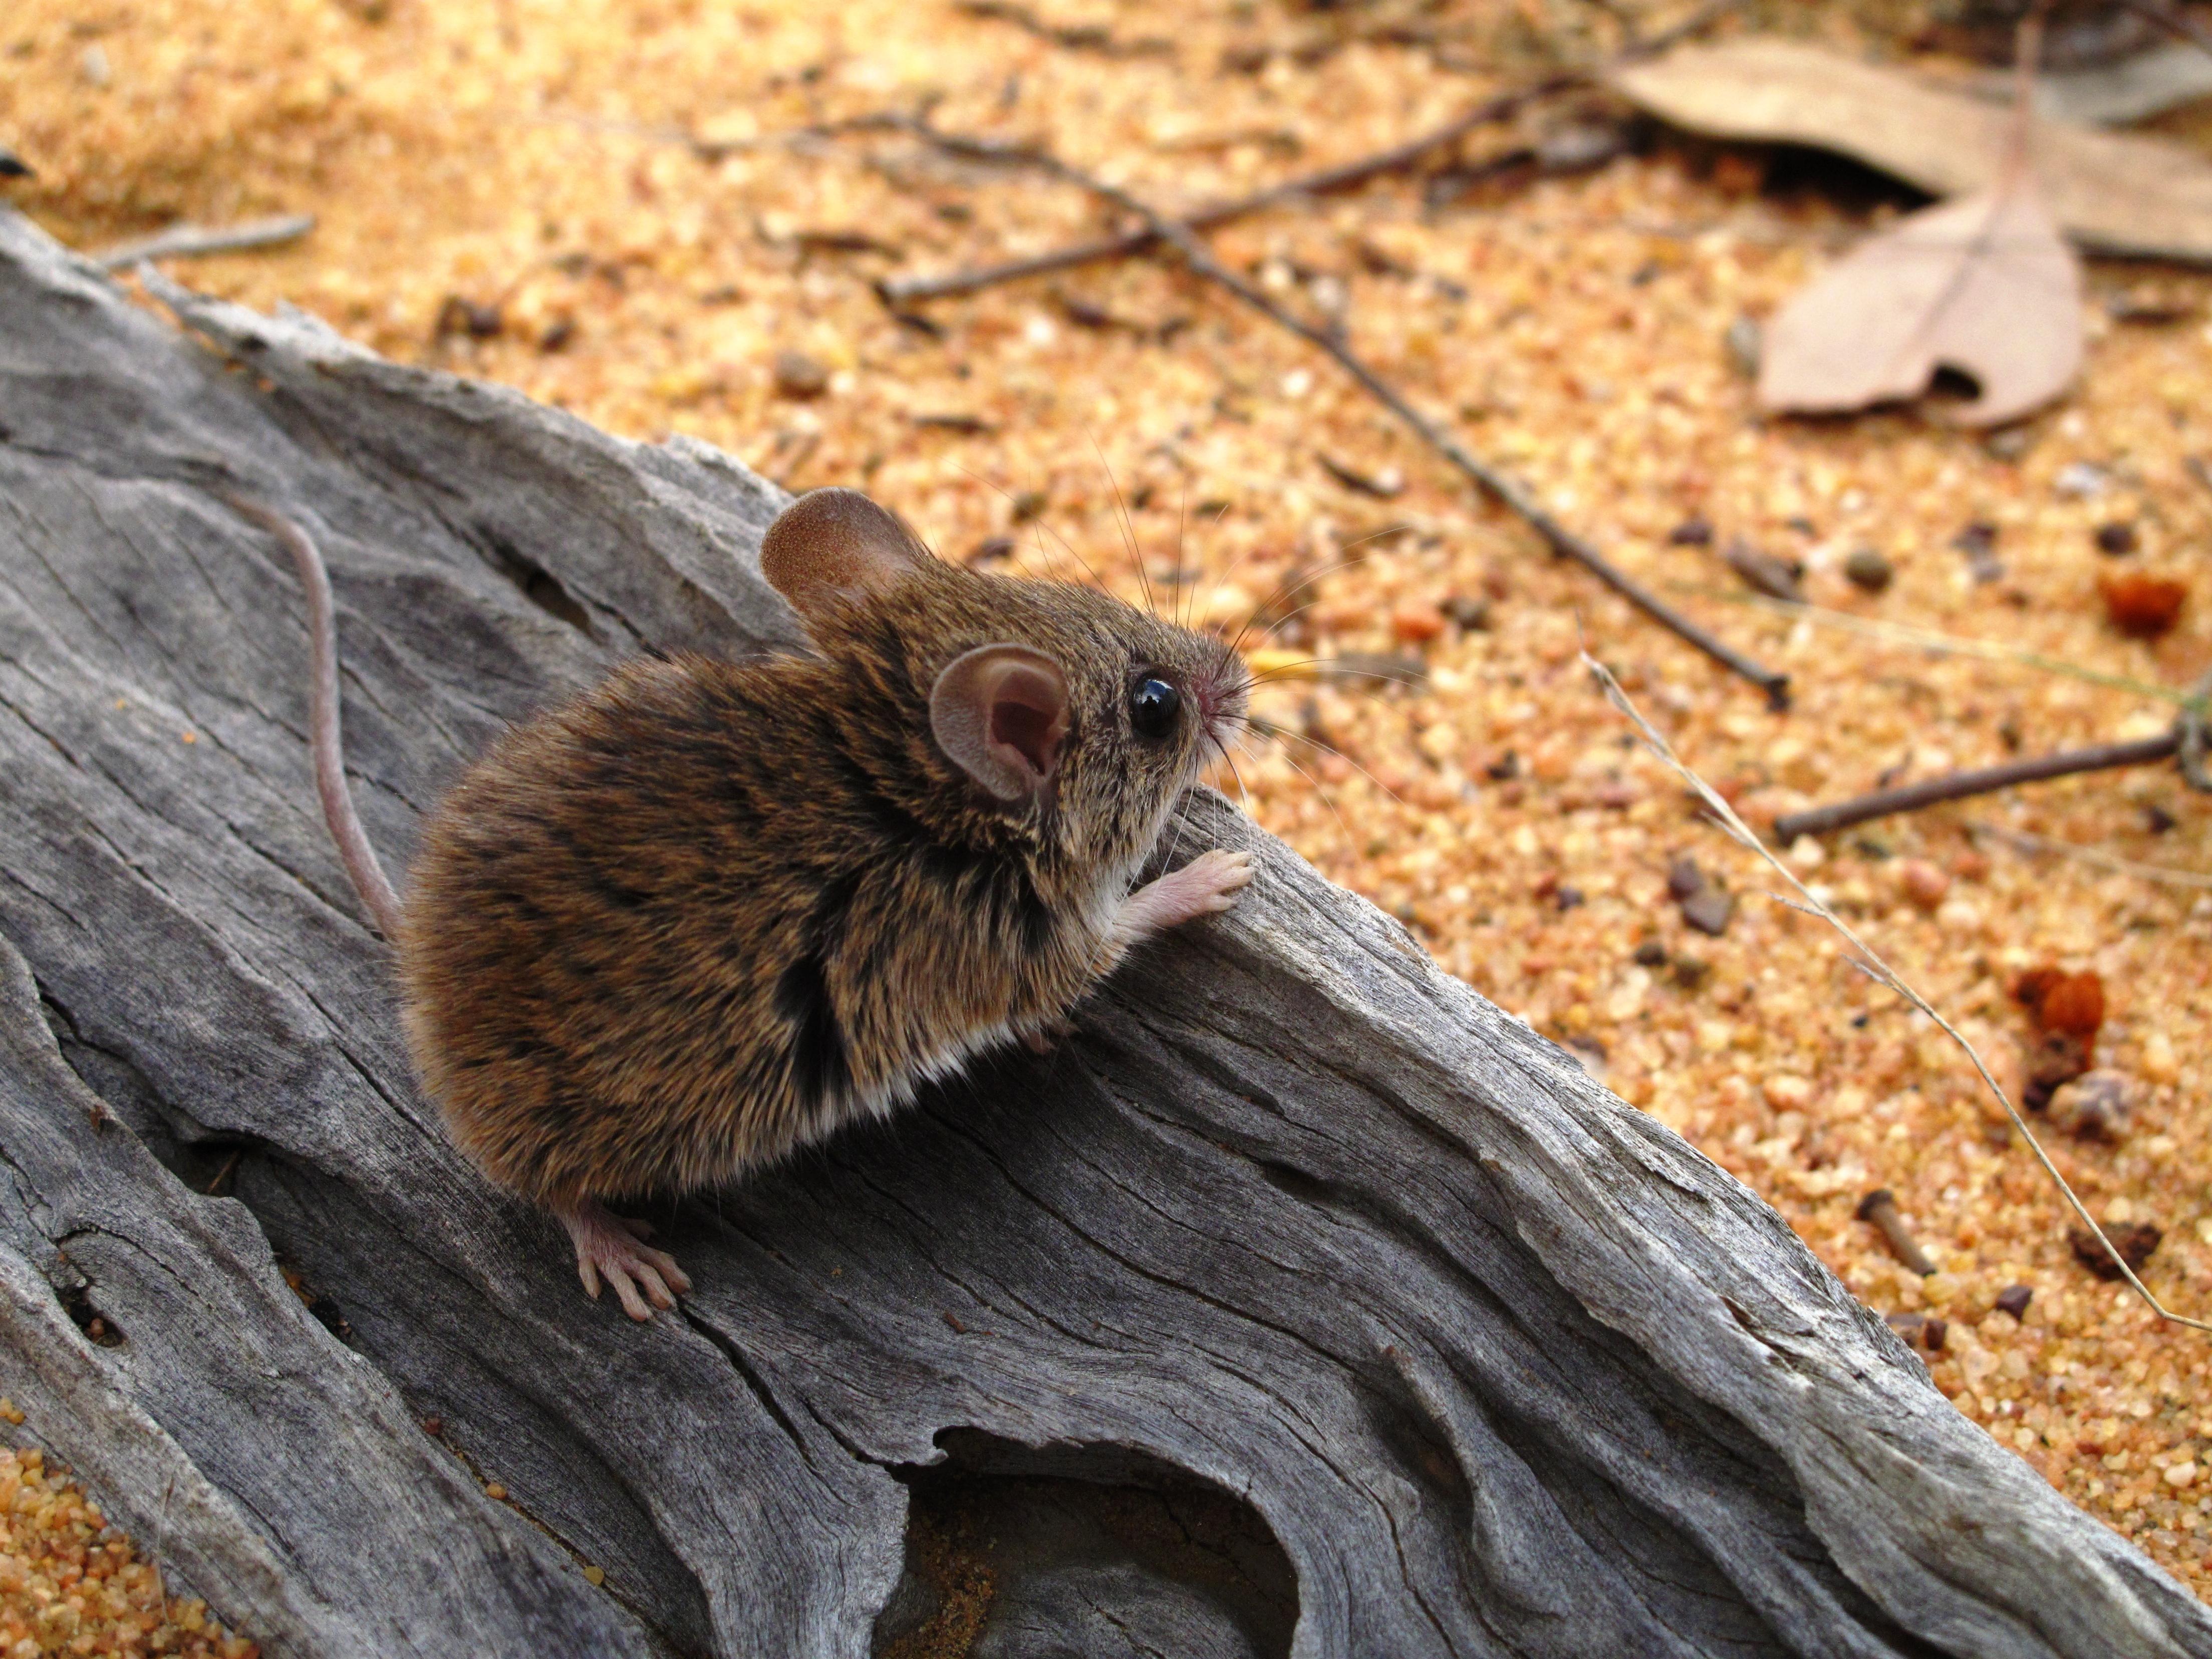 https://upload.wikimedia.org/wikipedia/commons/1/1f/Pseudomys_pilligaensis_-Pilliga_Forest%2C_New_South_Wales%2C_Australia-8.jpg